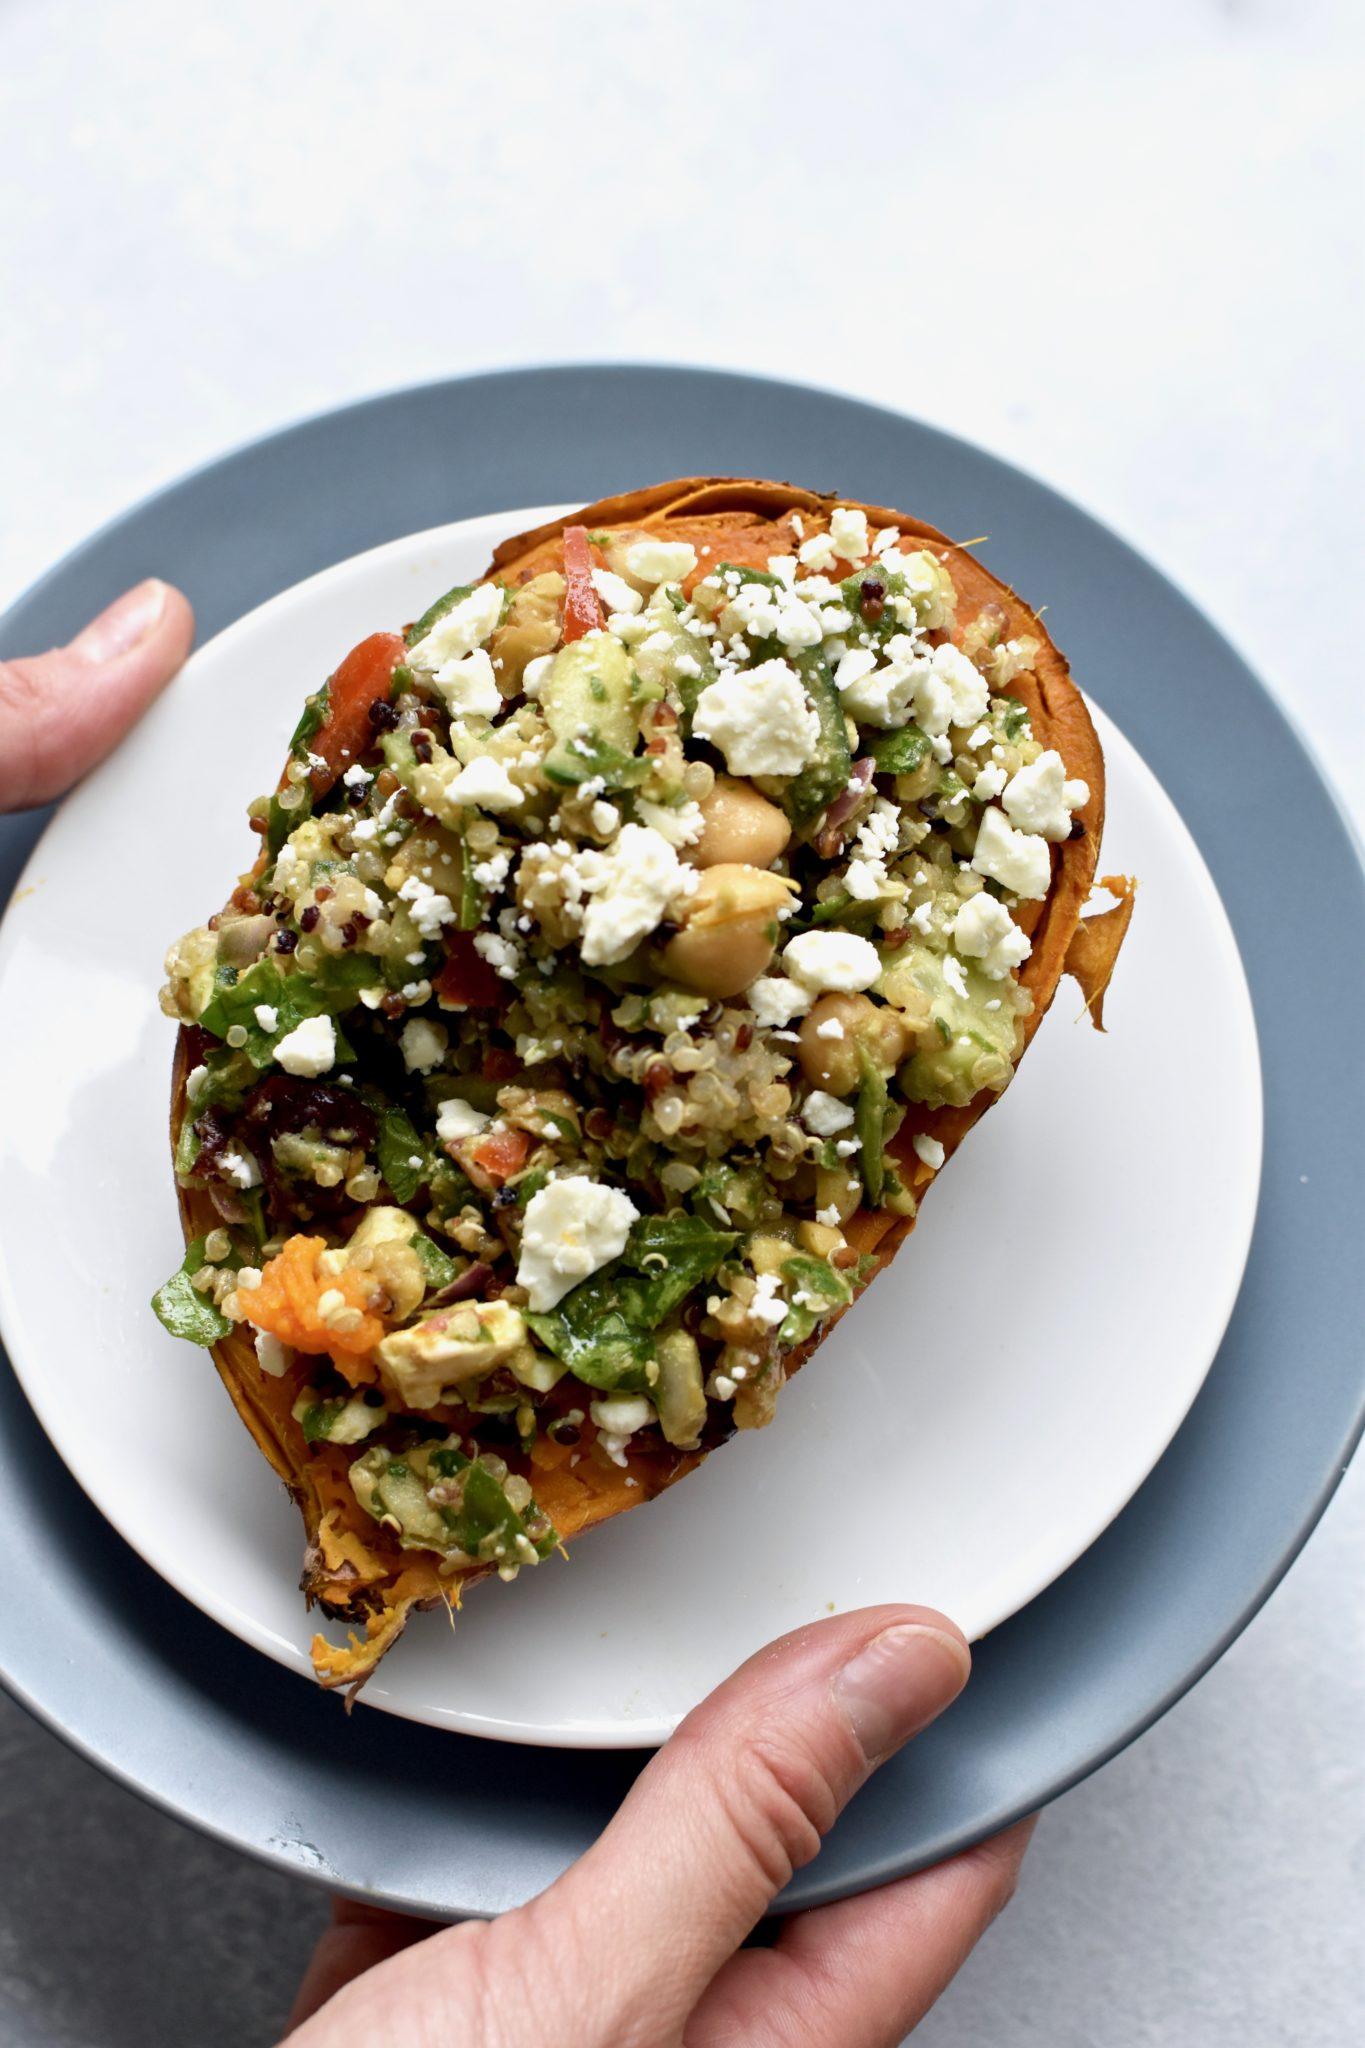 quinoa salad stuffed sweet potatoes // cait's plate